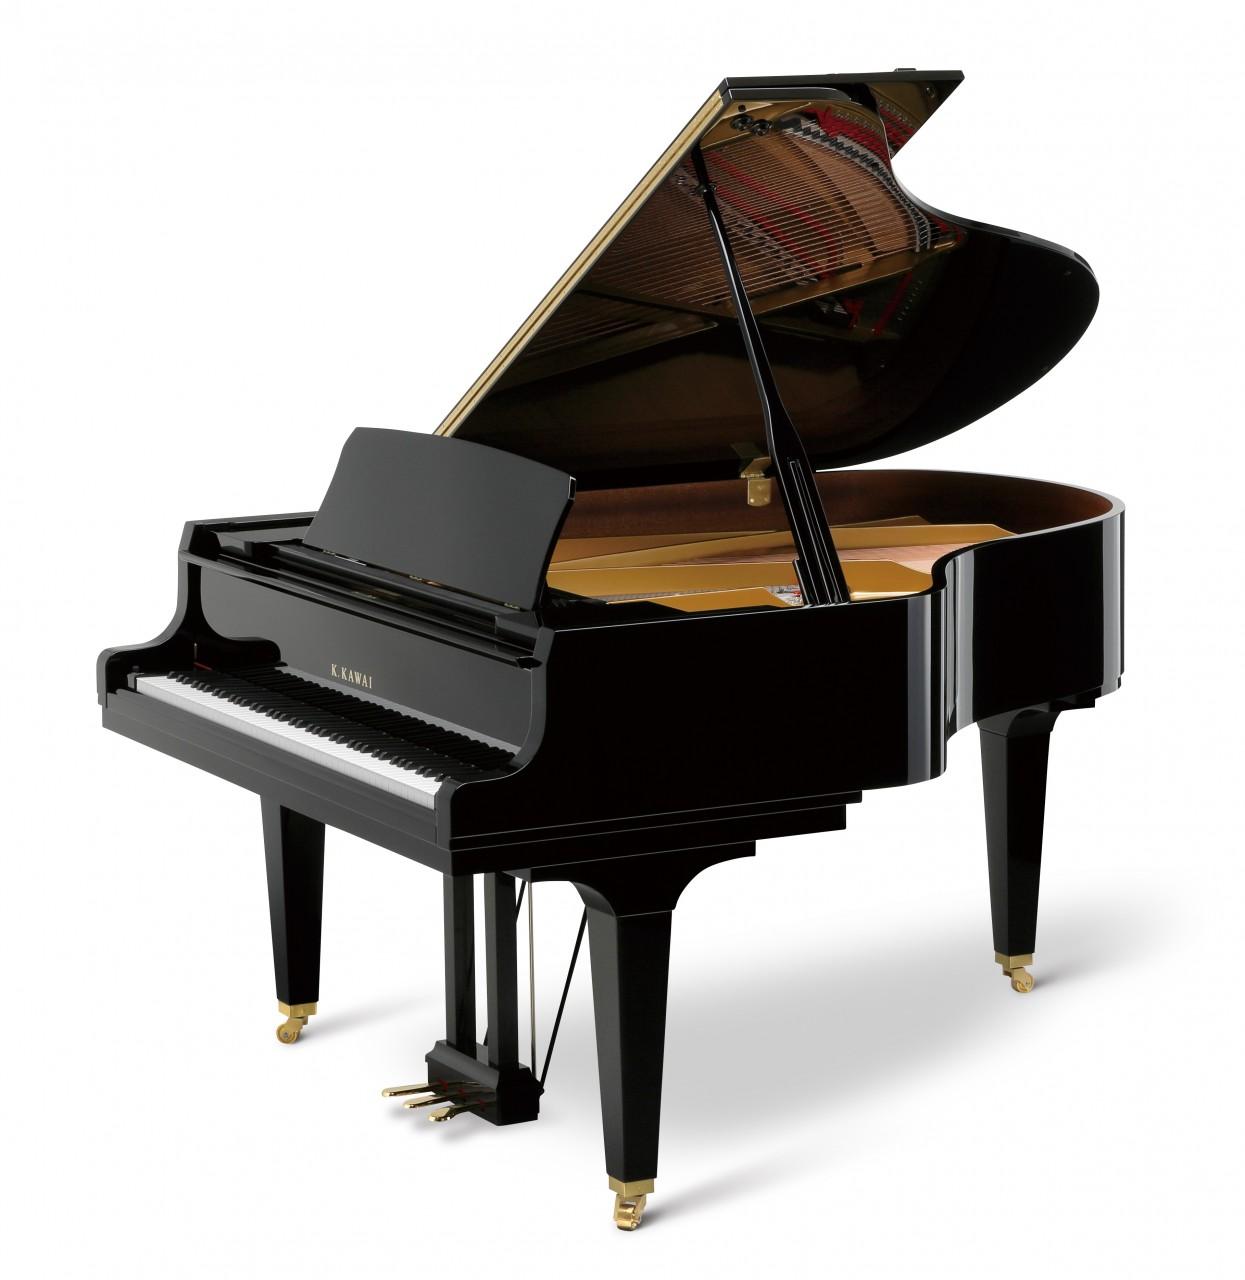 kawai,gl-50,grand,piano,sale,dorset,showroom,shop